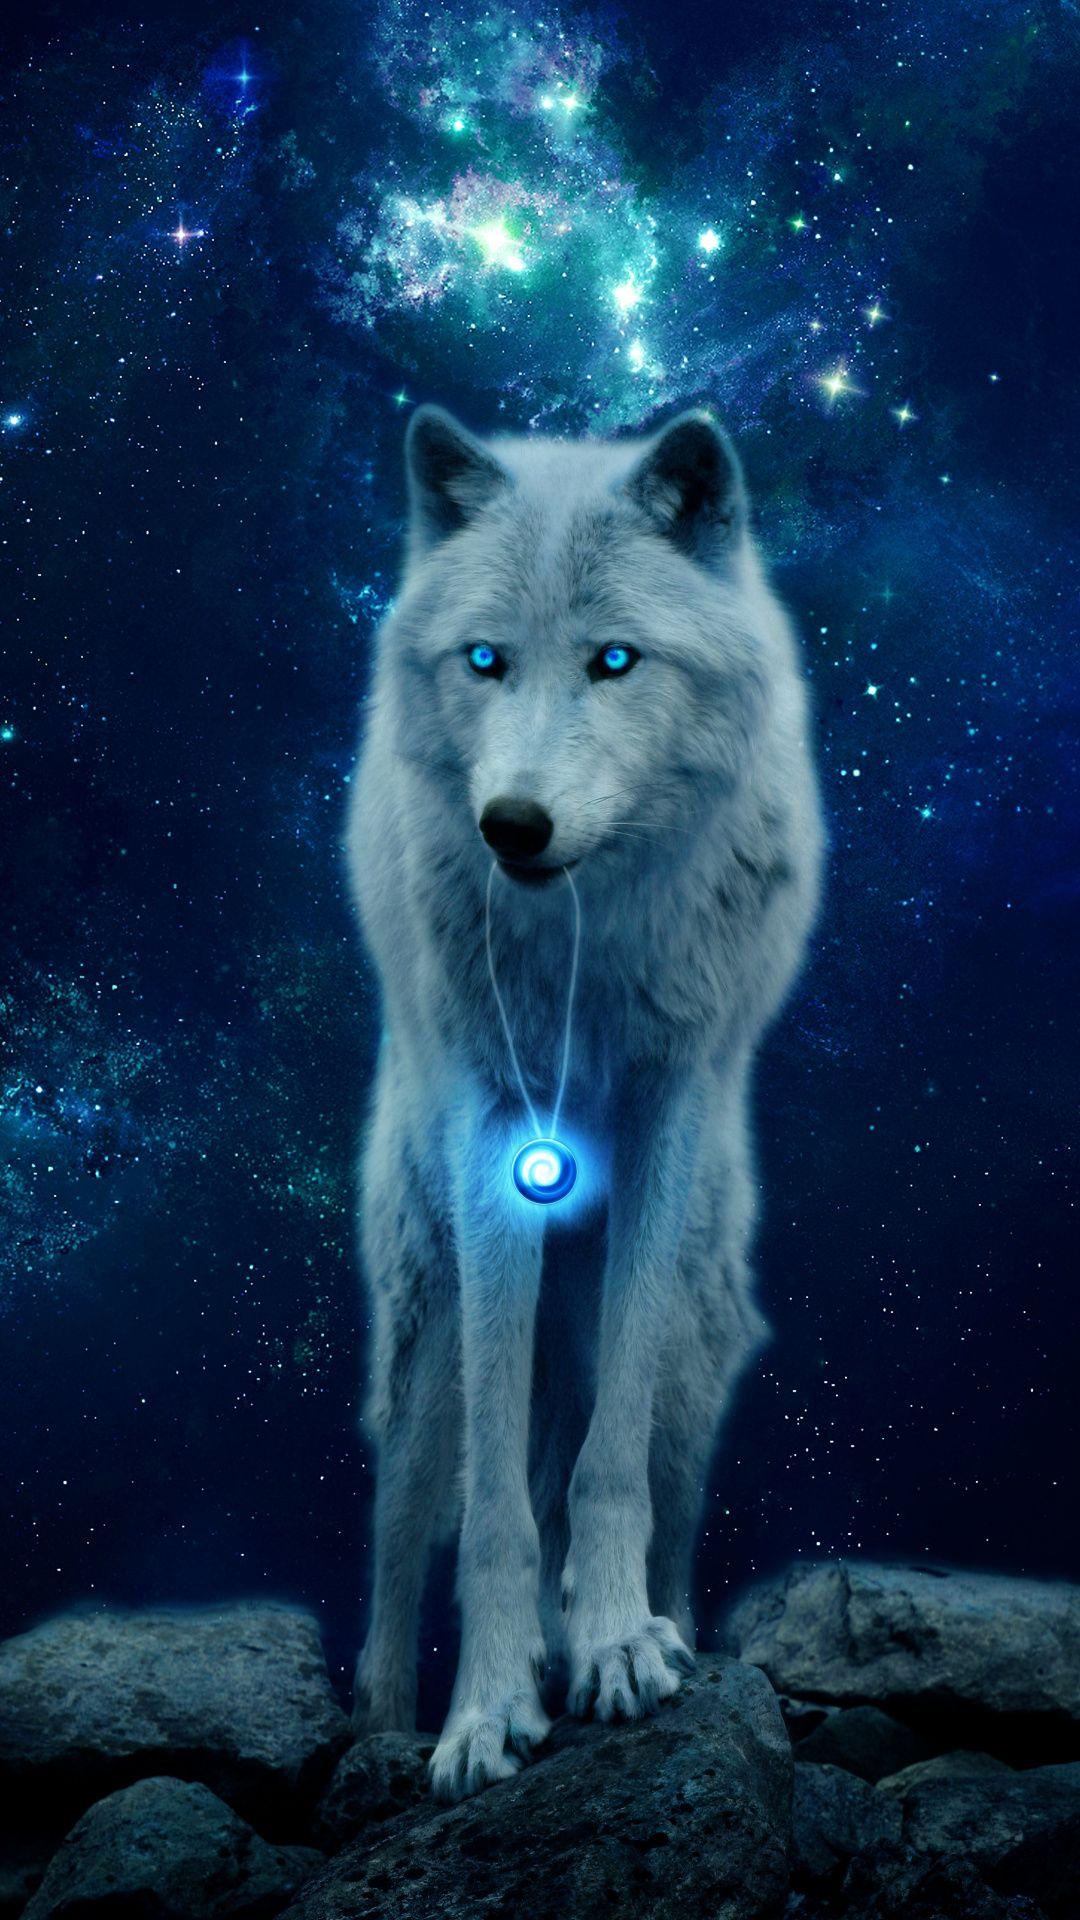 Wallpapers Digital Art Art Arctic Wolf Canis Lupus Tundrarum Dog Like Mammal Wolf Spirit Animal Wolf Spirit Wolf Art Fantasy